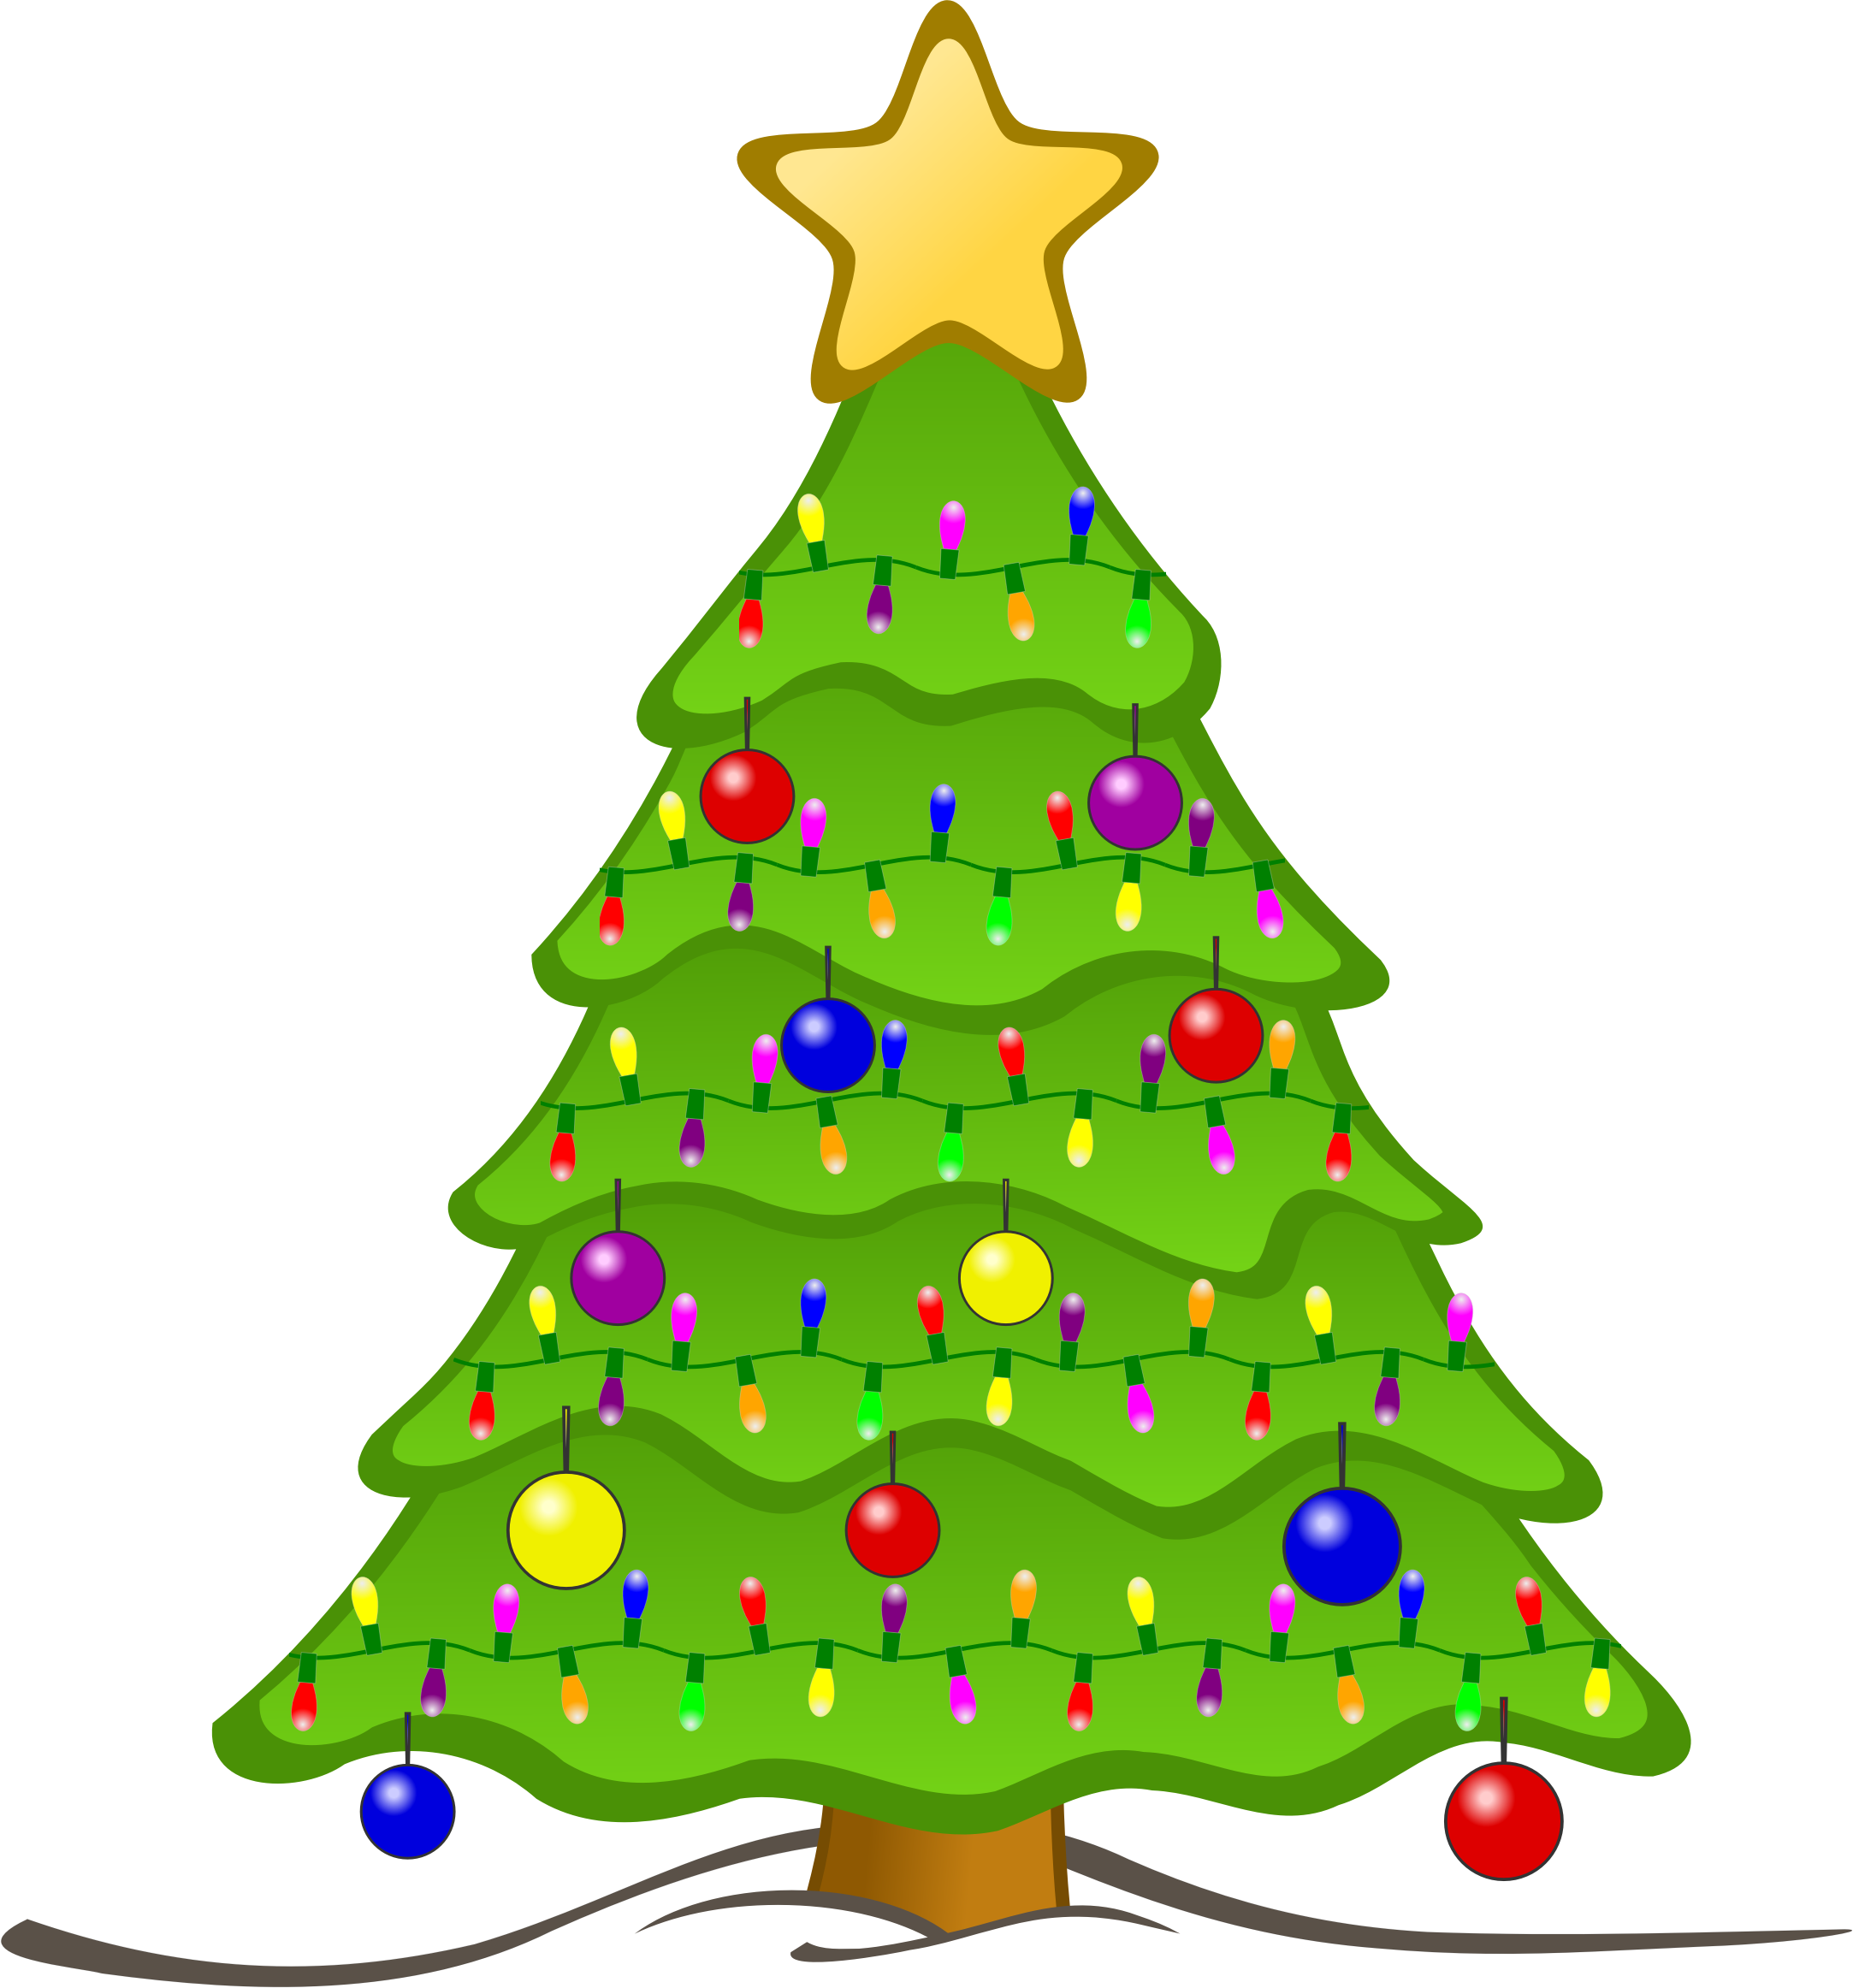 Animated Christmas Tree Clipart.